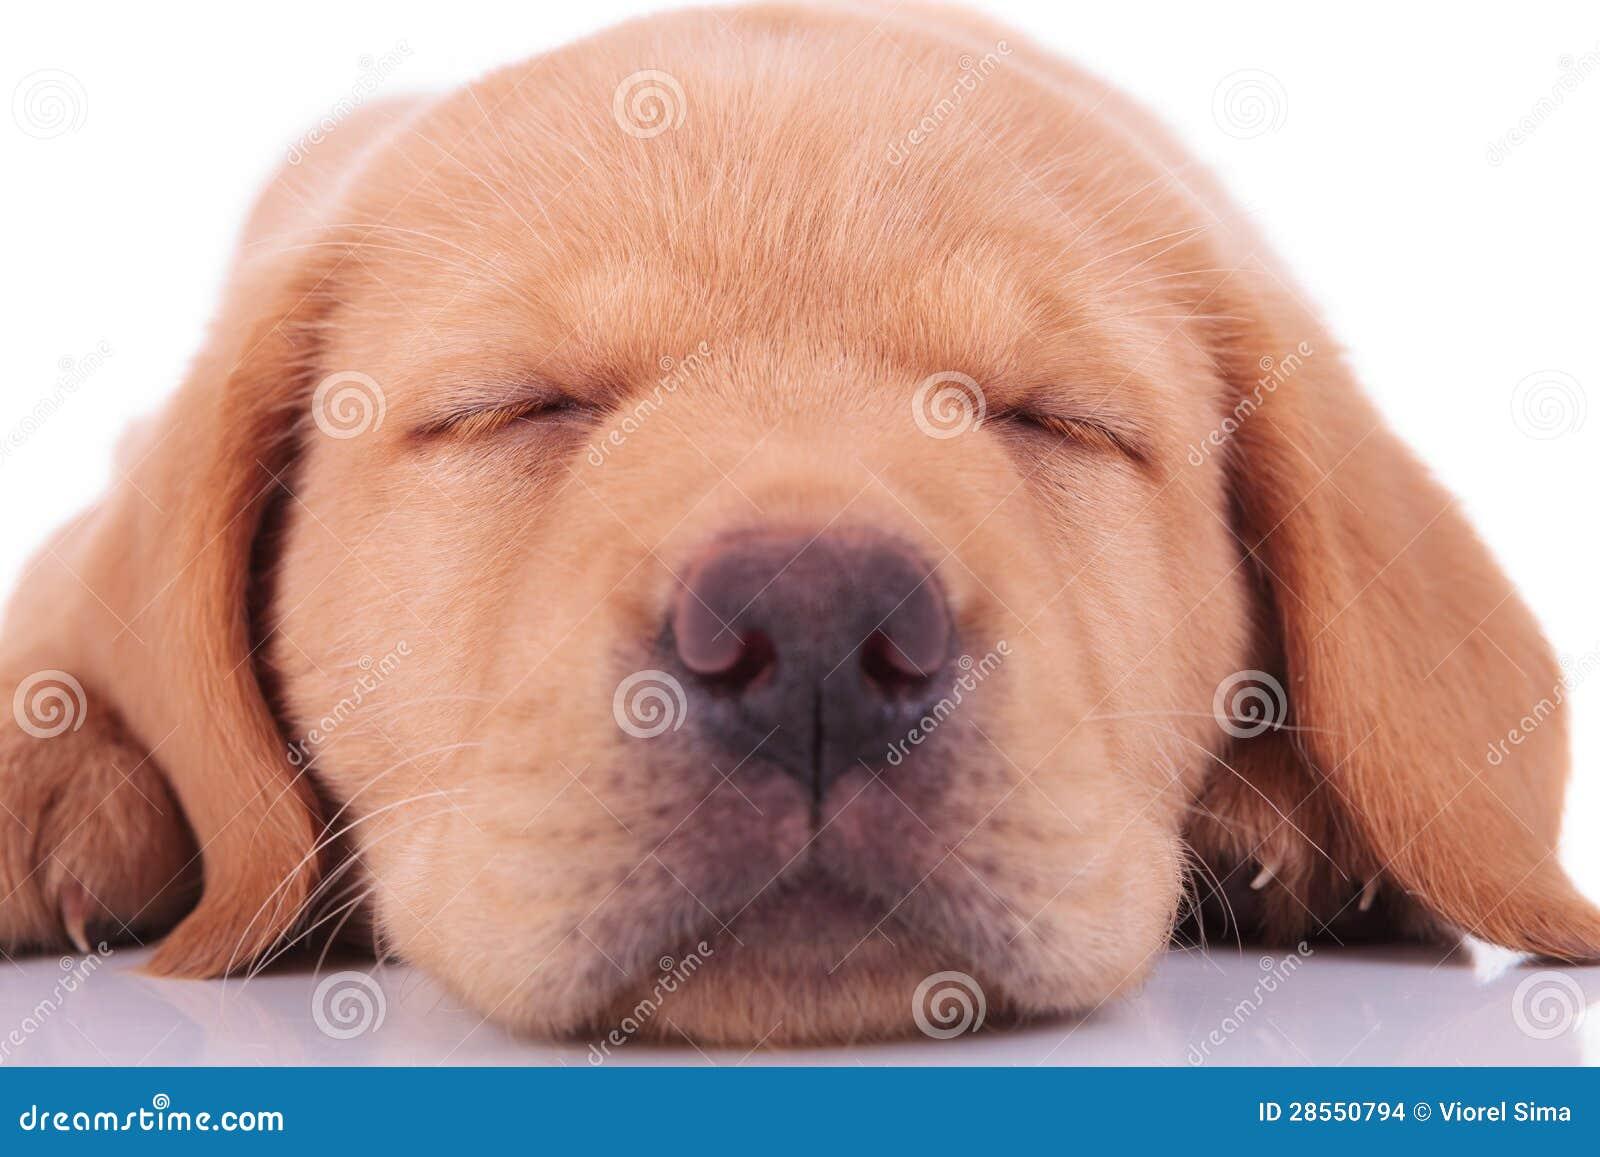 Head of a sleeping labrador retriever puppy dog